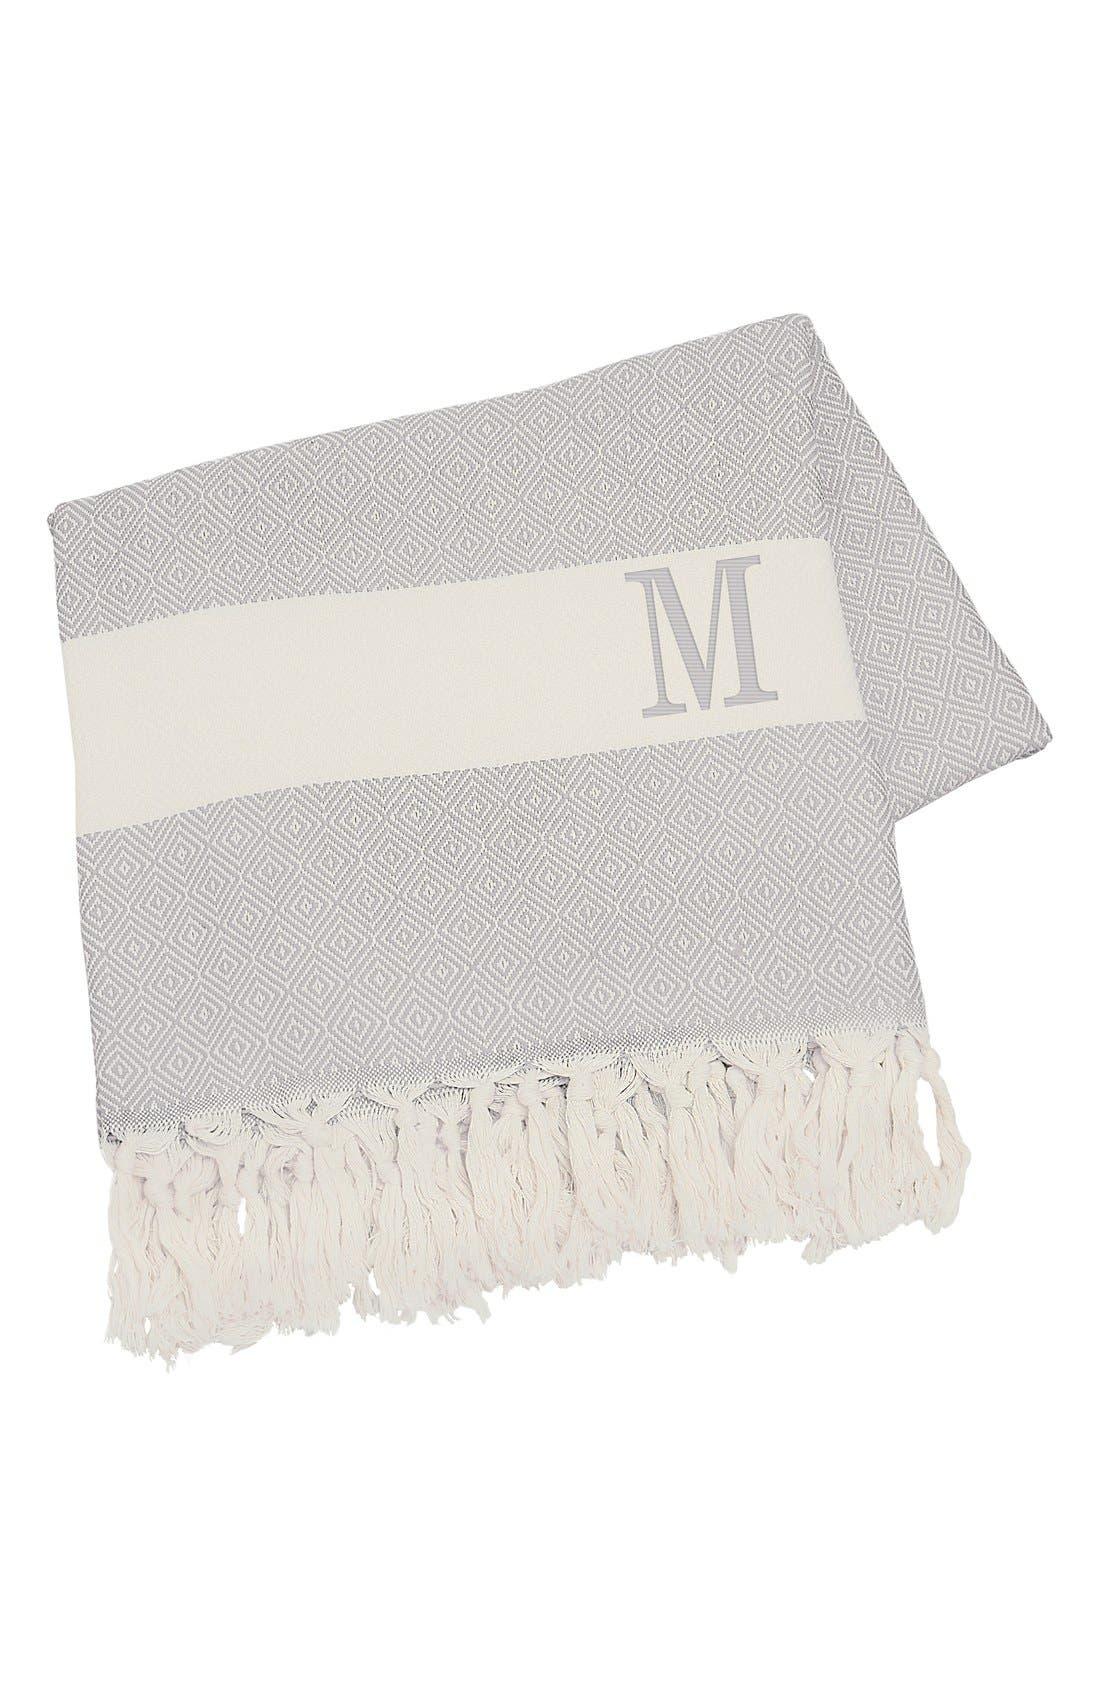 Monogram Turkish Cotton Throw,                         Main,                         color, Grey - M